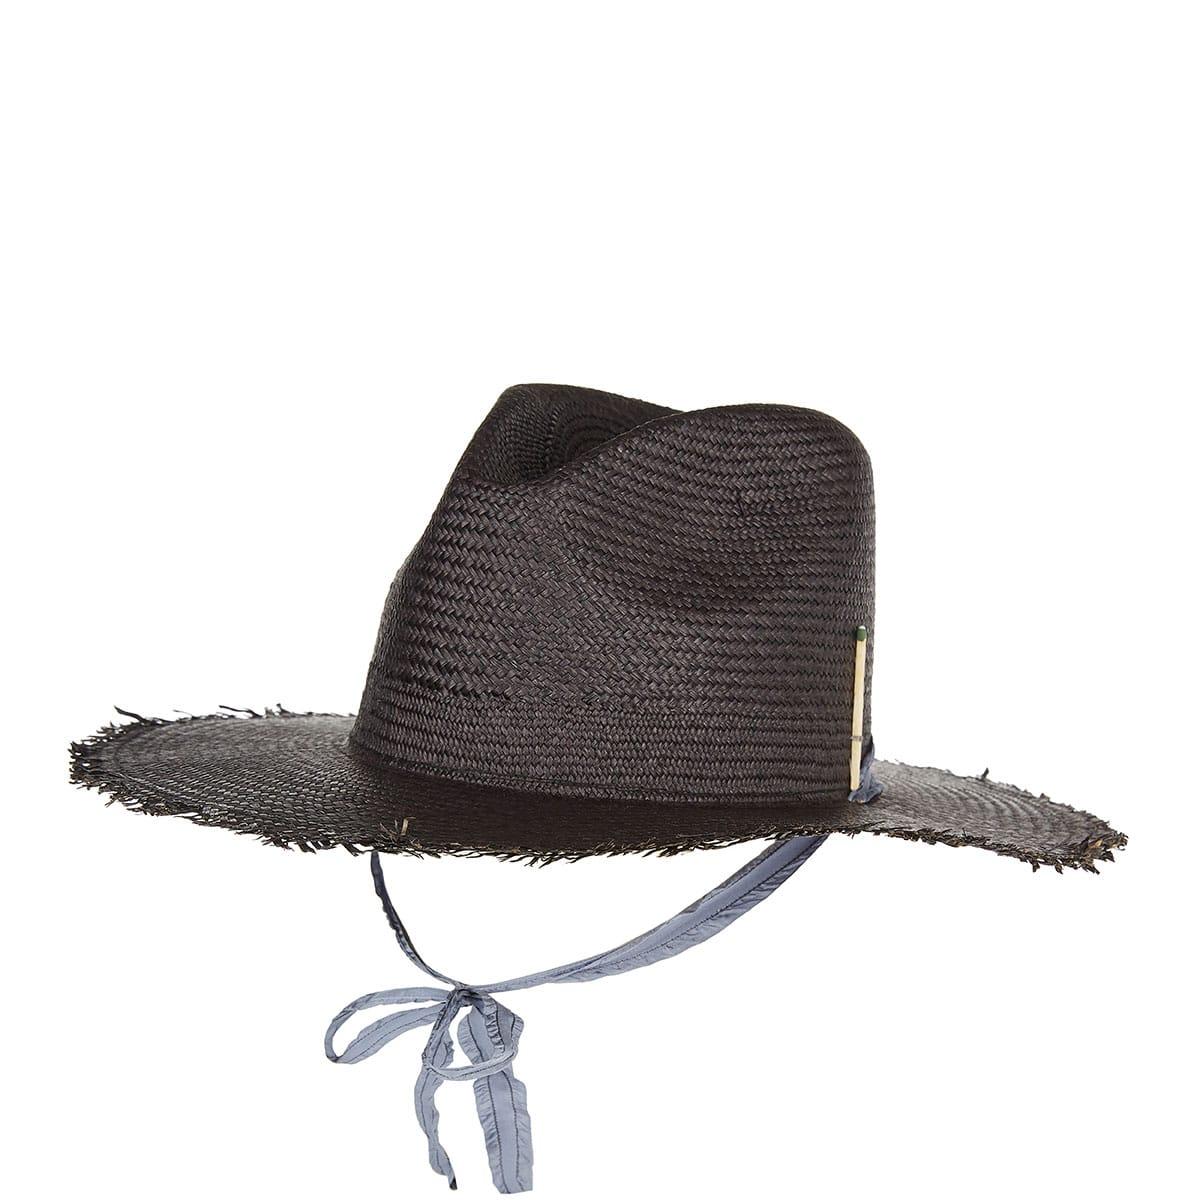 Brock X Nick 3 straw fedora hat